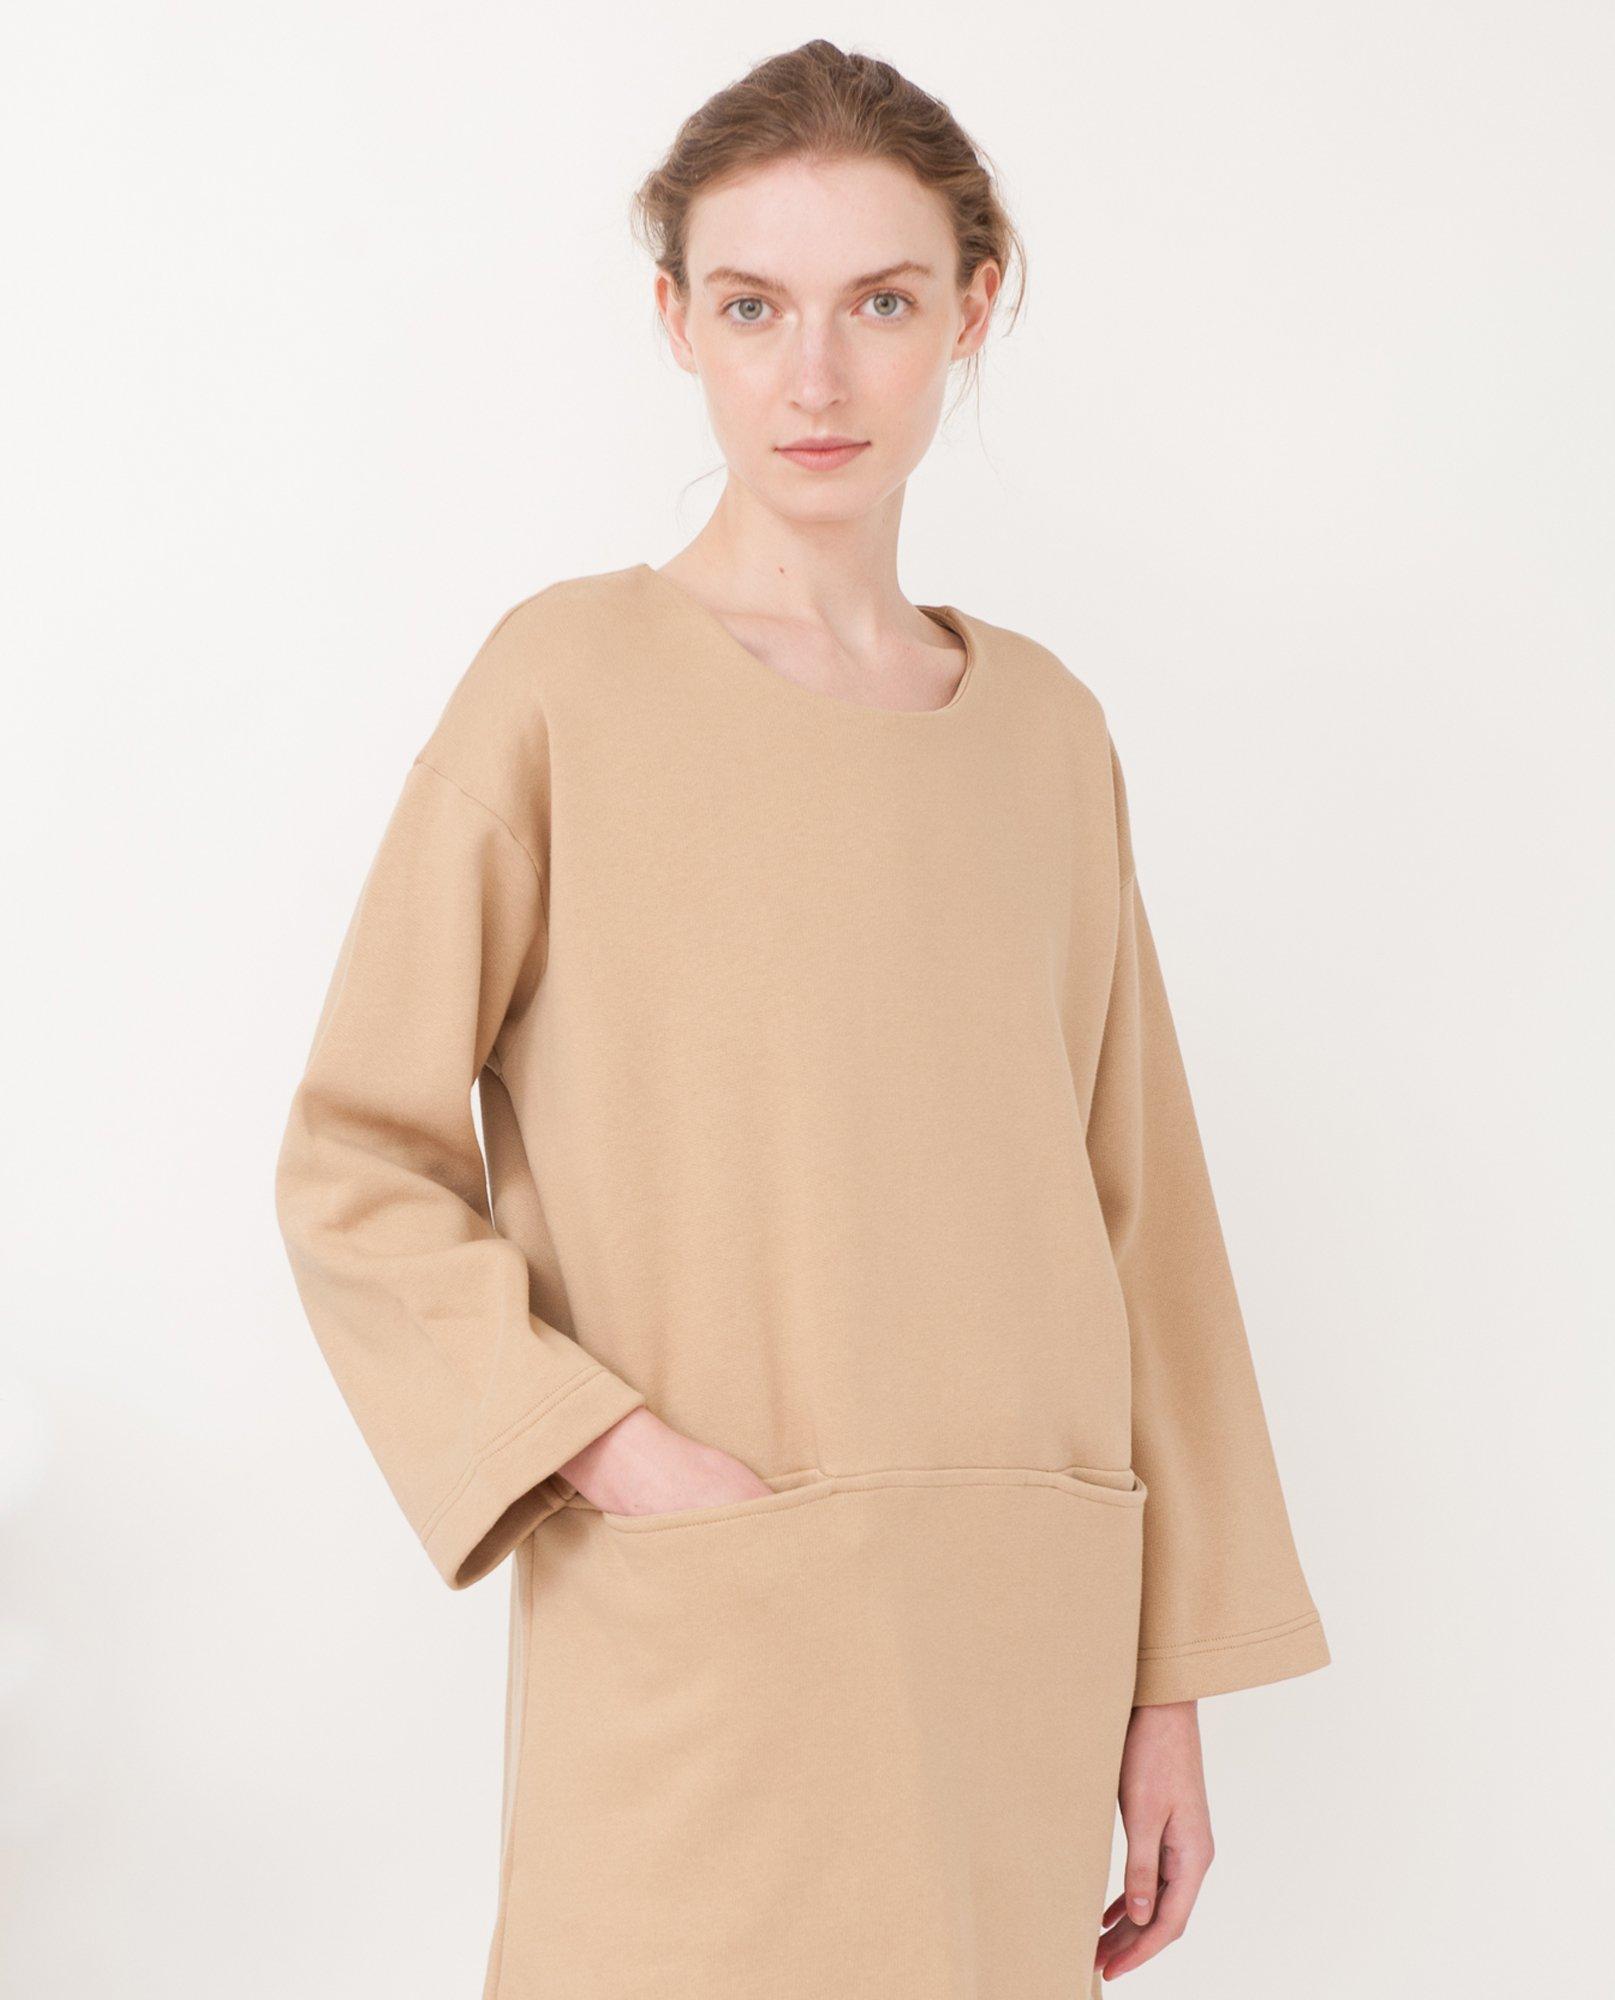 IDA Organic Cotton Sweatshirt Dress In Stone from Beaumont Organic